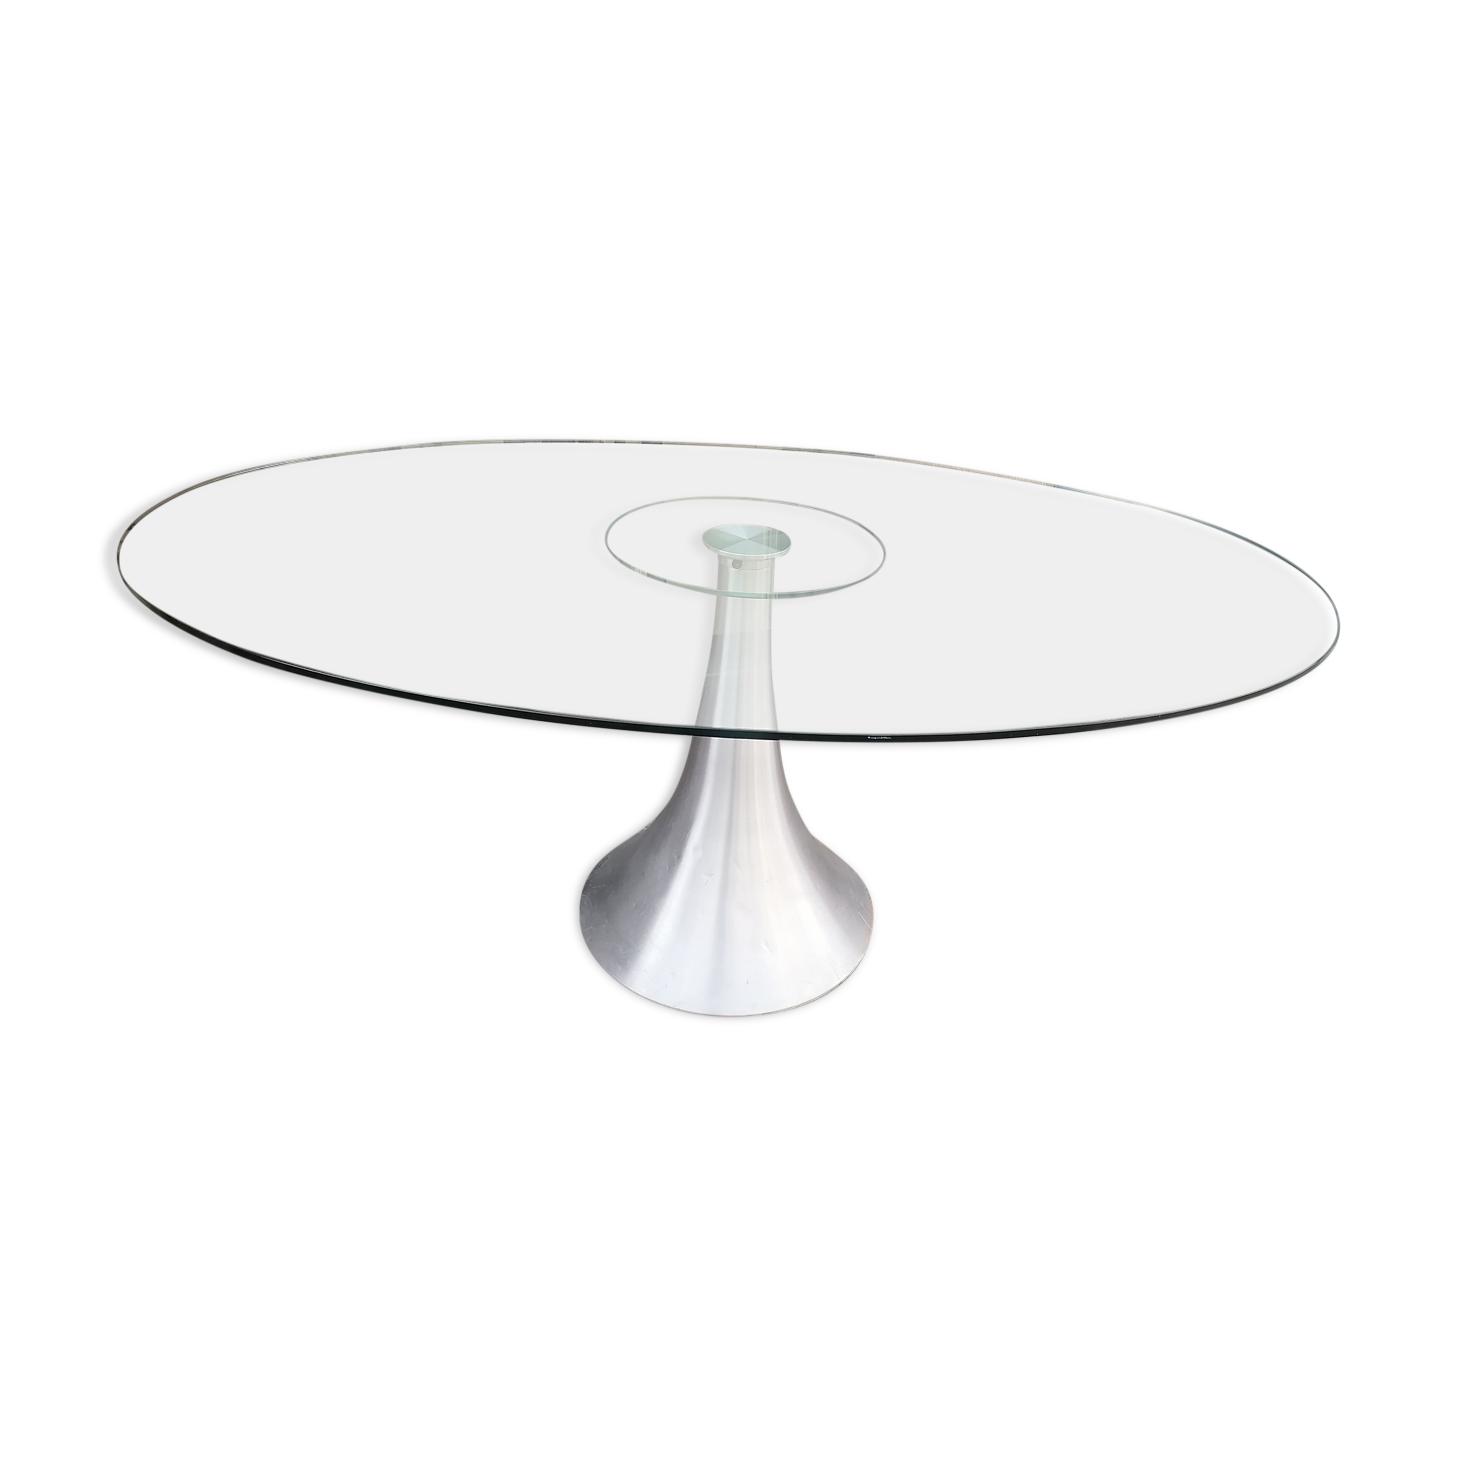 Table design en verre Kare 1970/80